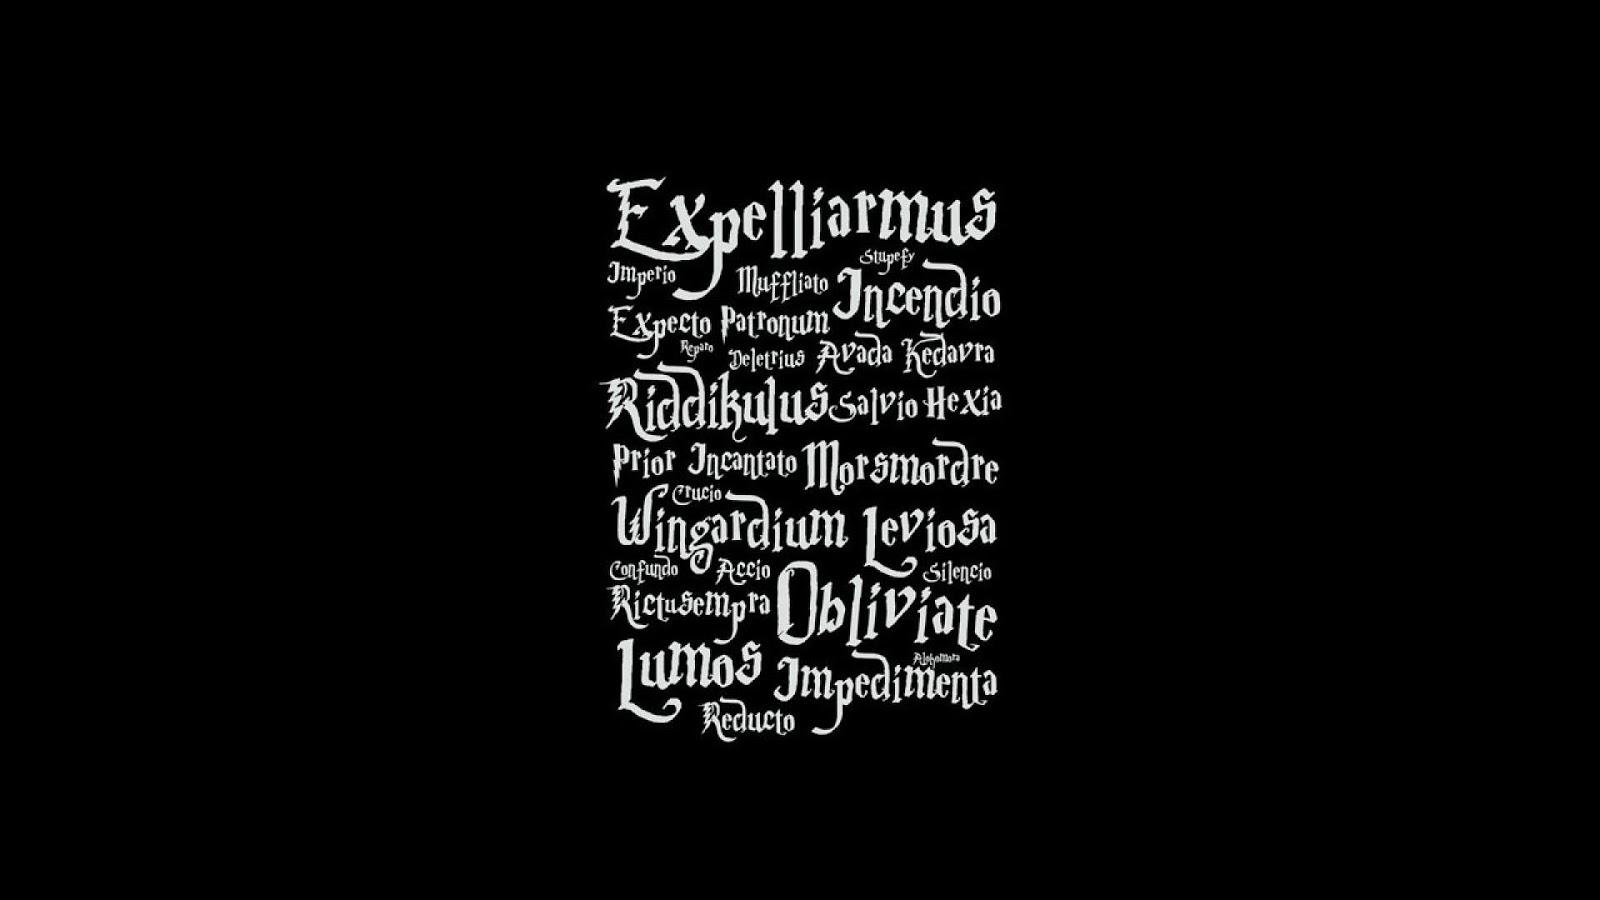 V For Vendetta Quotes Phone Wallpaper Harry Potter 30 Papeis De Parede Pc Dream Land